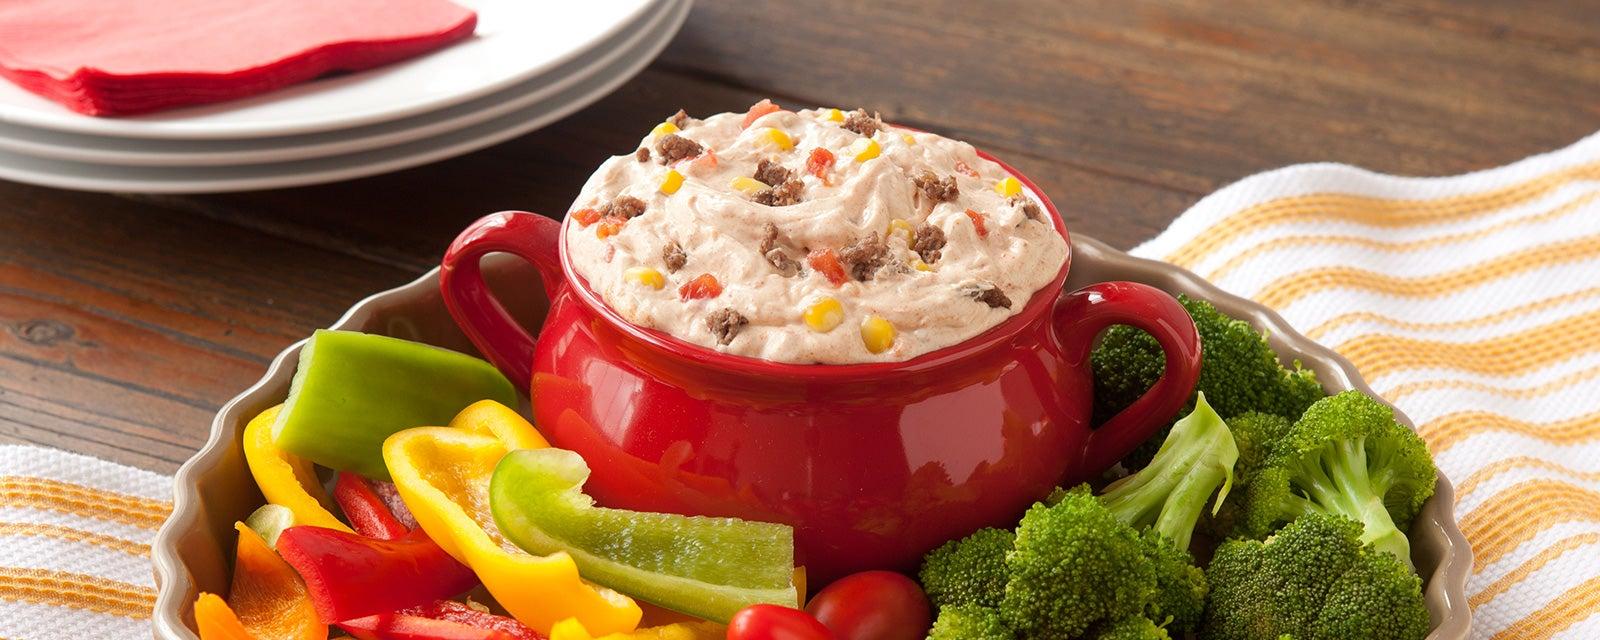 Creamy Goulash Dip